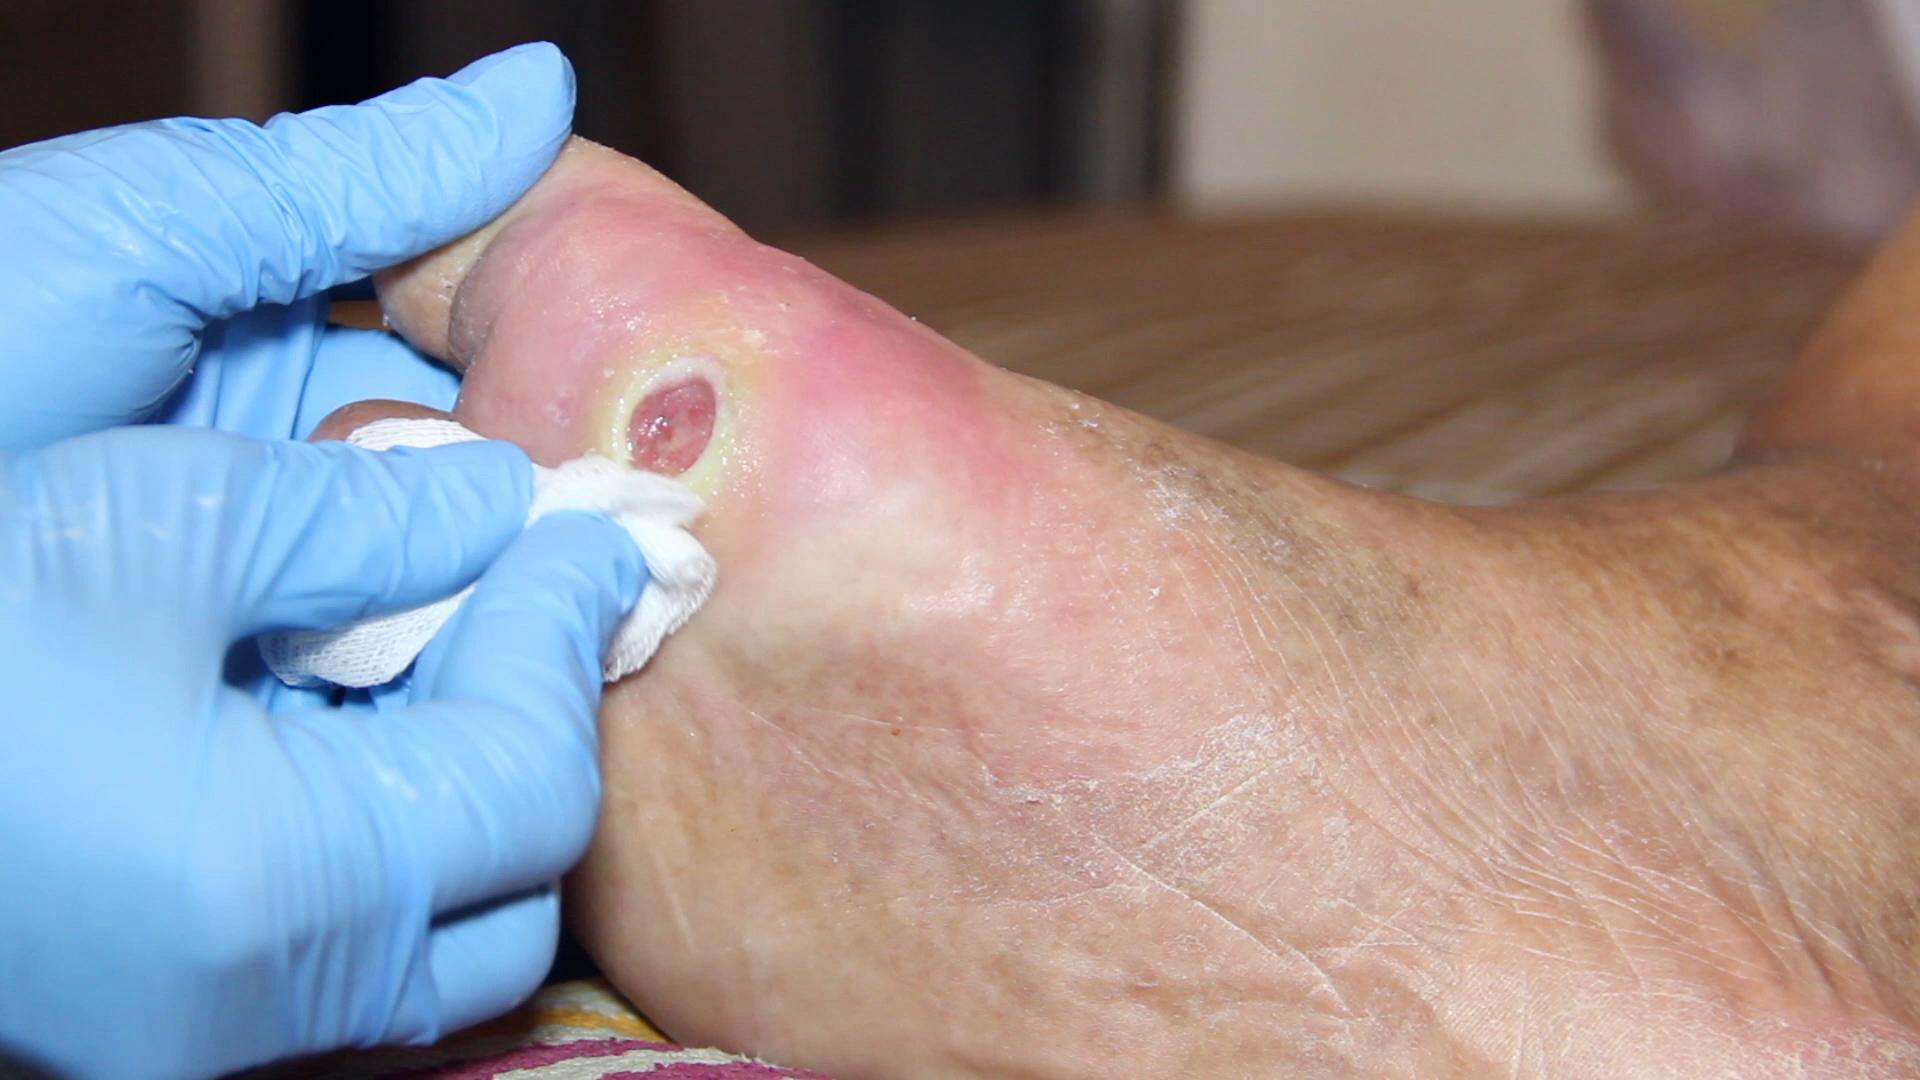 A Case of Pyoderma Gangrenosum (PG) Mistaken for DM Ulcer